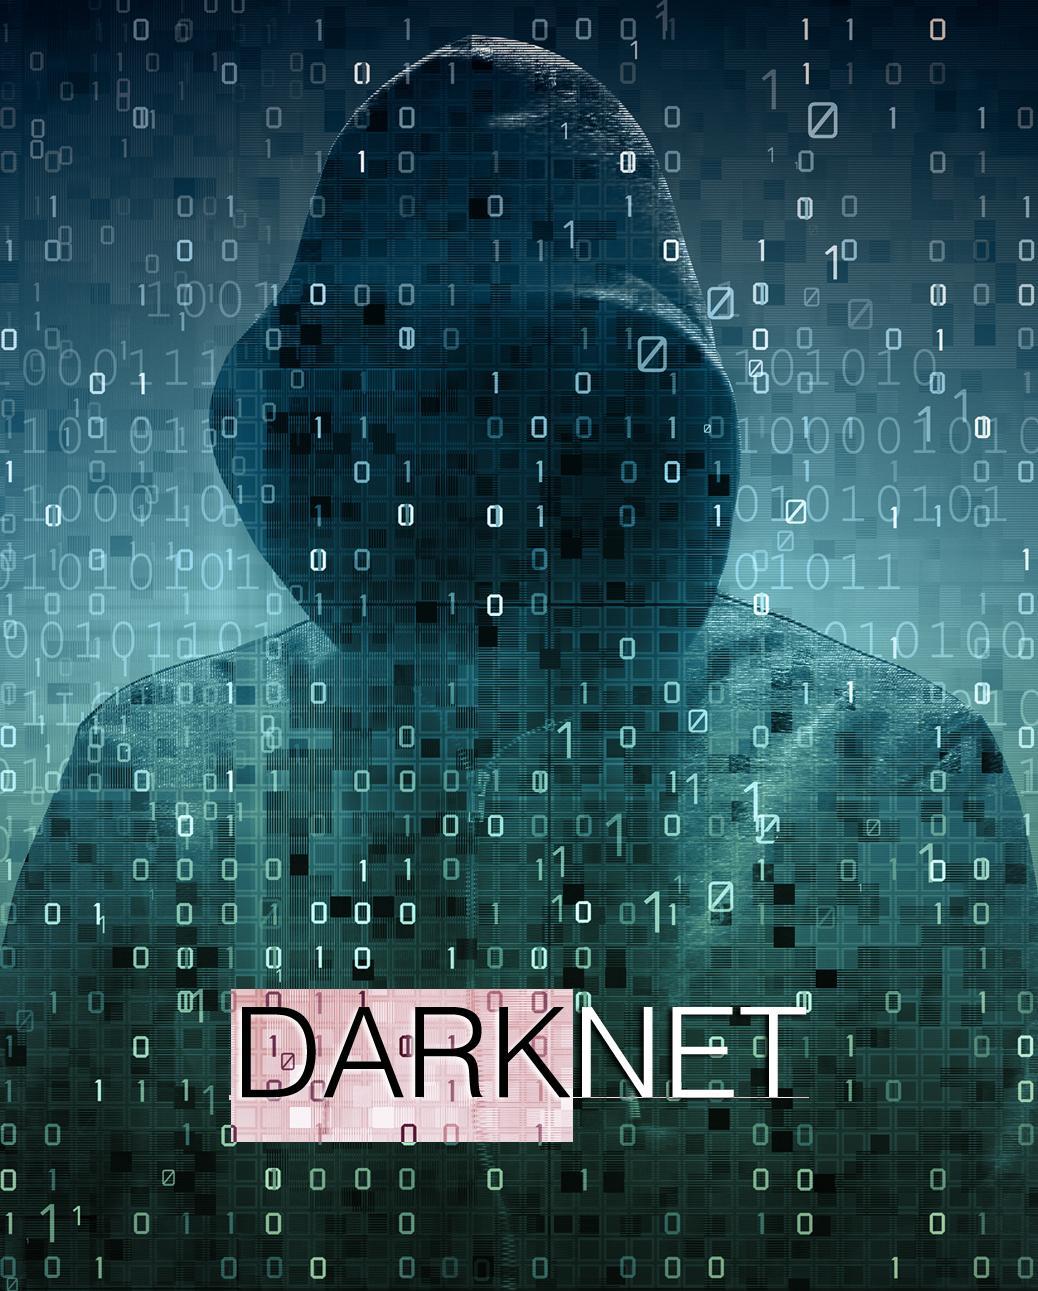 DarkNet drugs site takedown - bearish for Bitcoin?